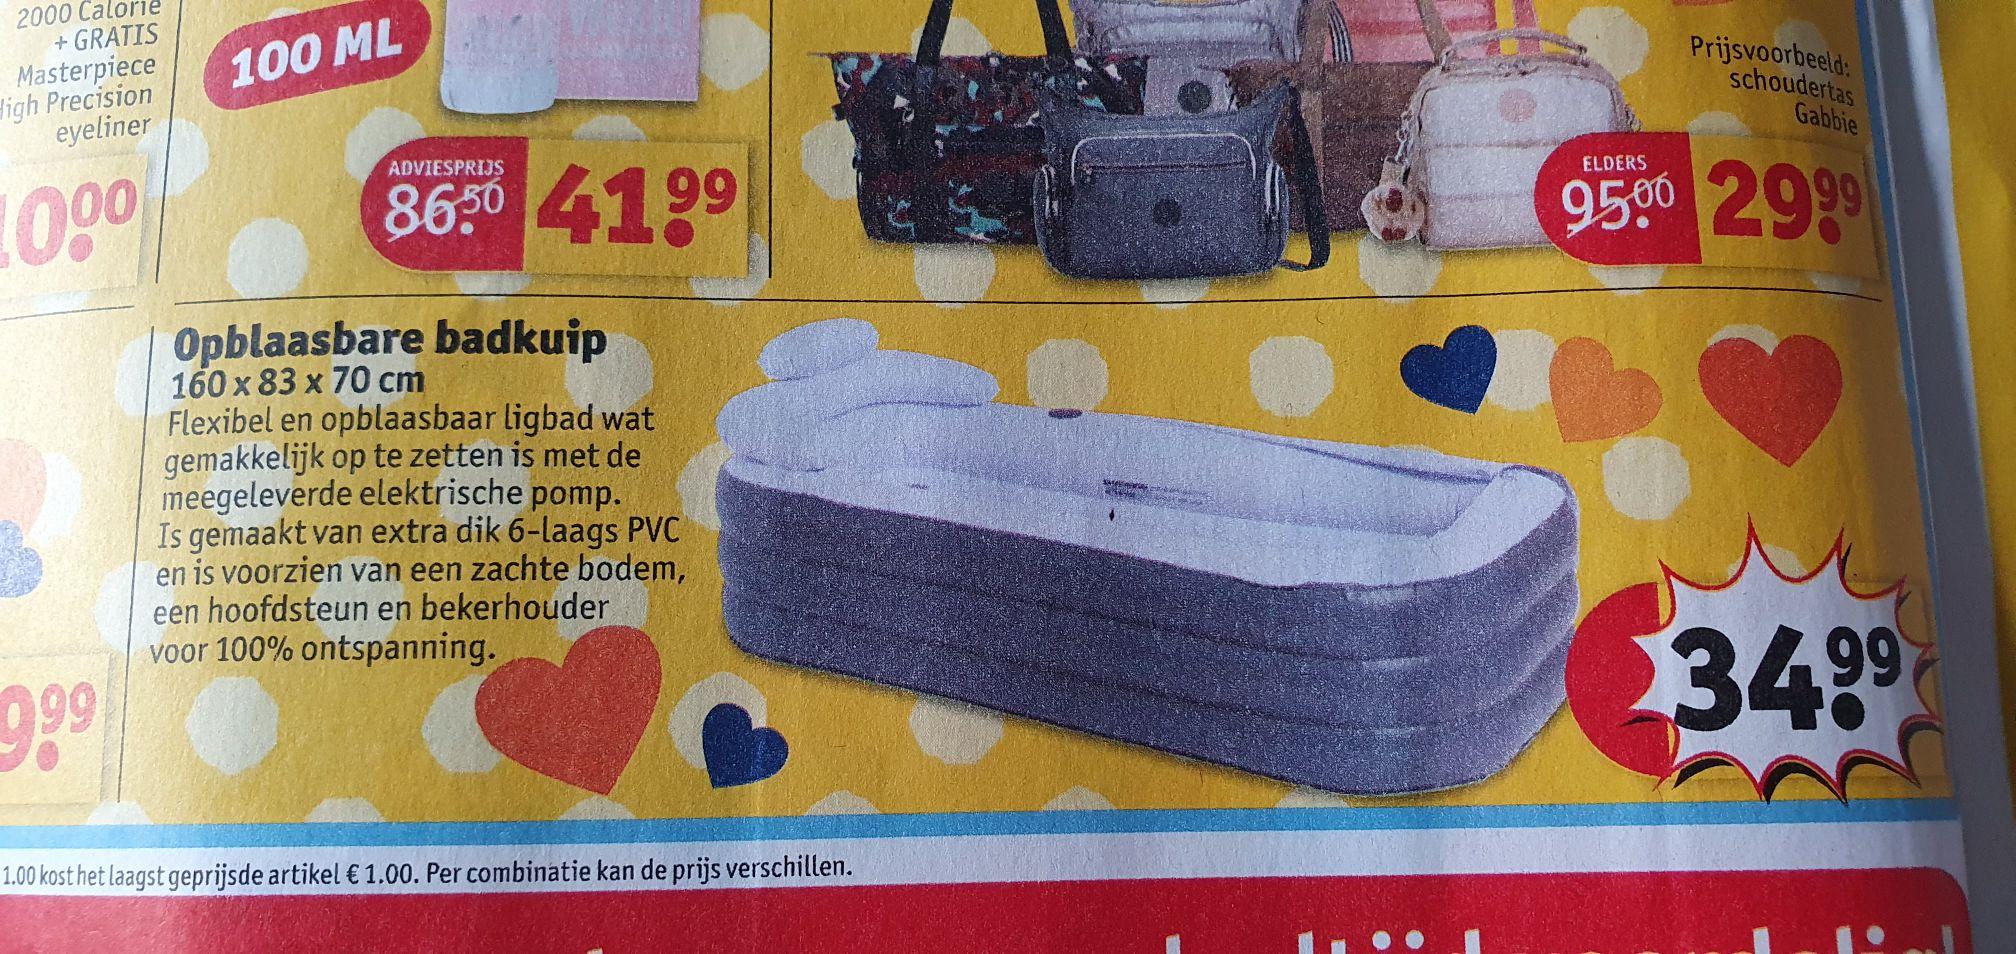 Opblaasbare badkuip 160x83x70cm